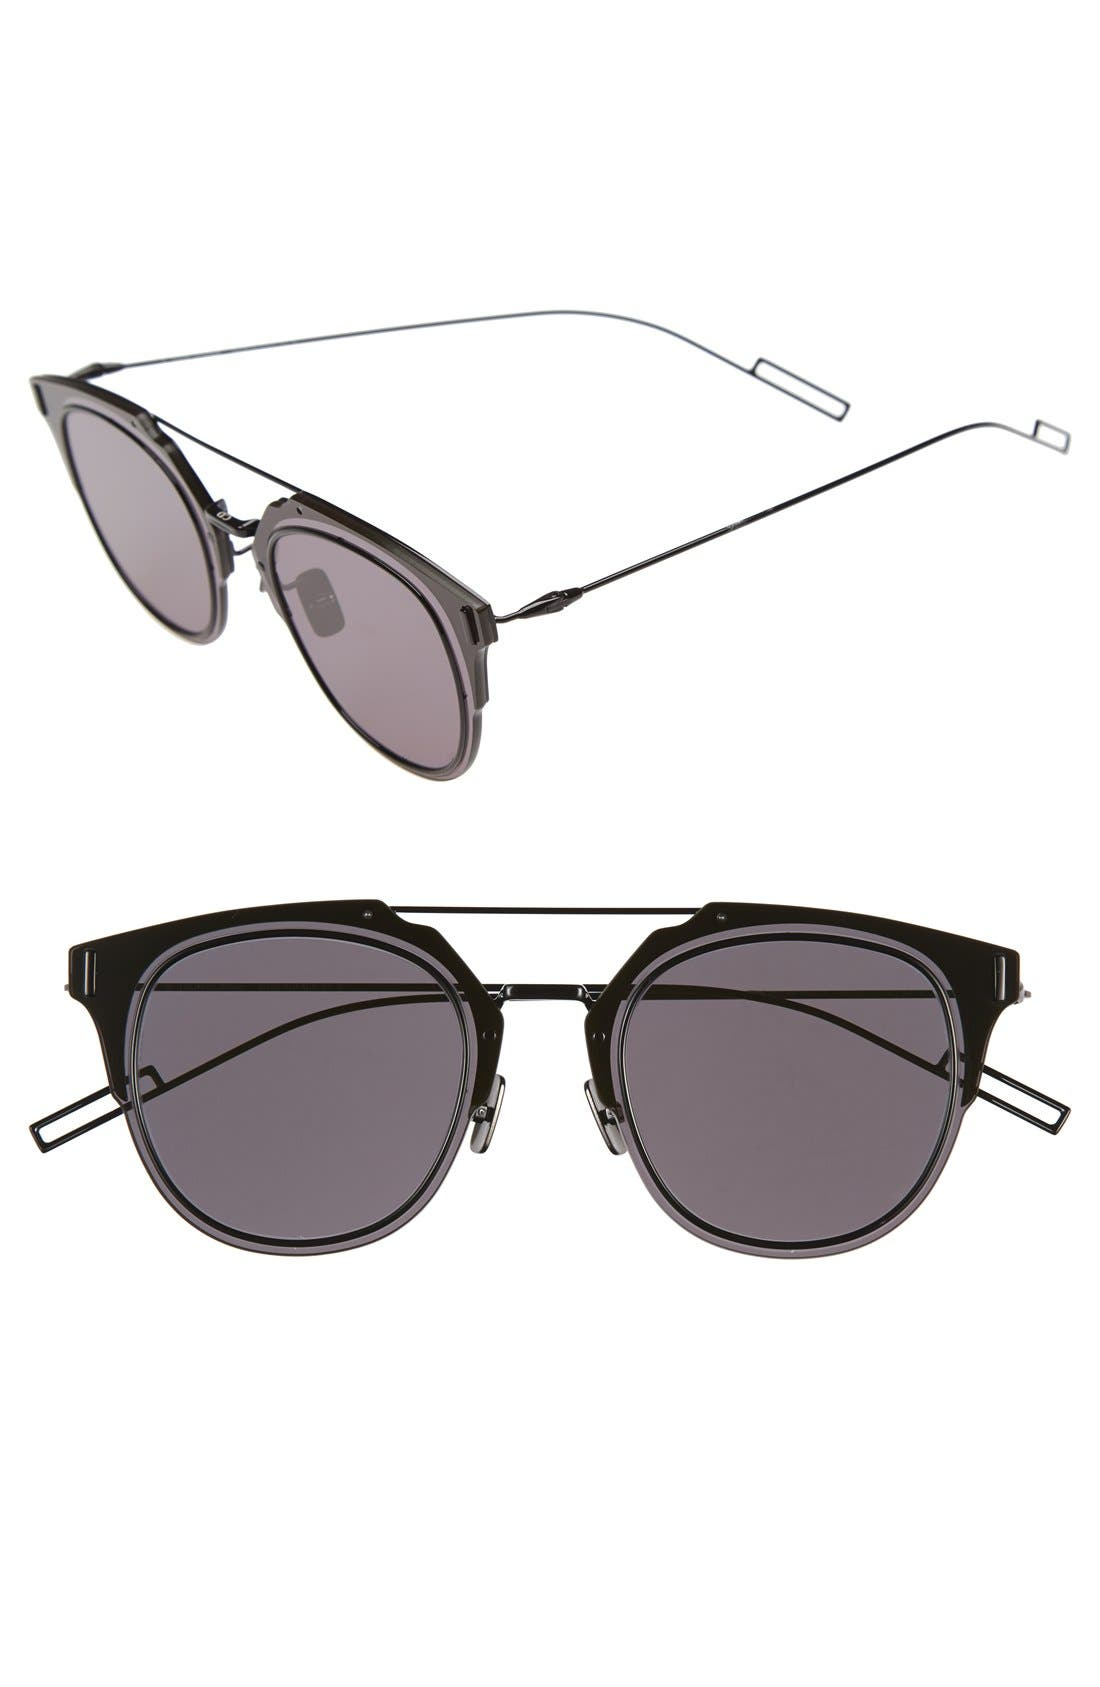 DIOR HOMME Composit 1.0S 62mm Metal Shield Sunglasses